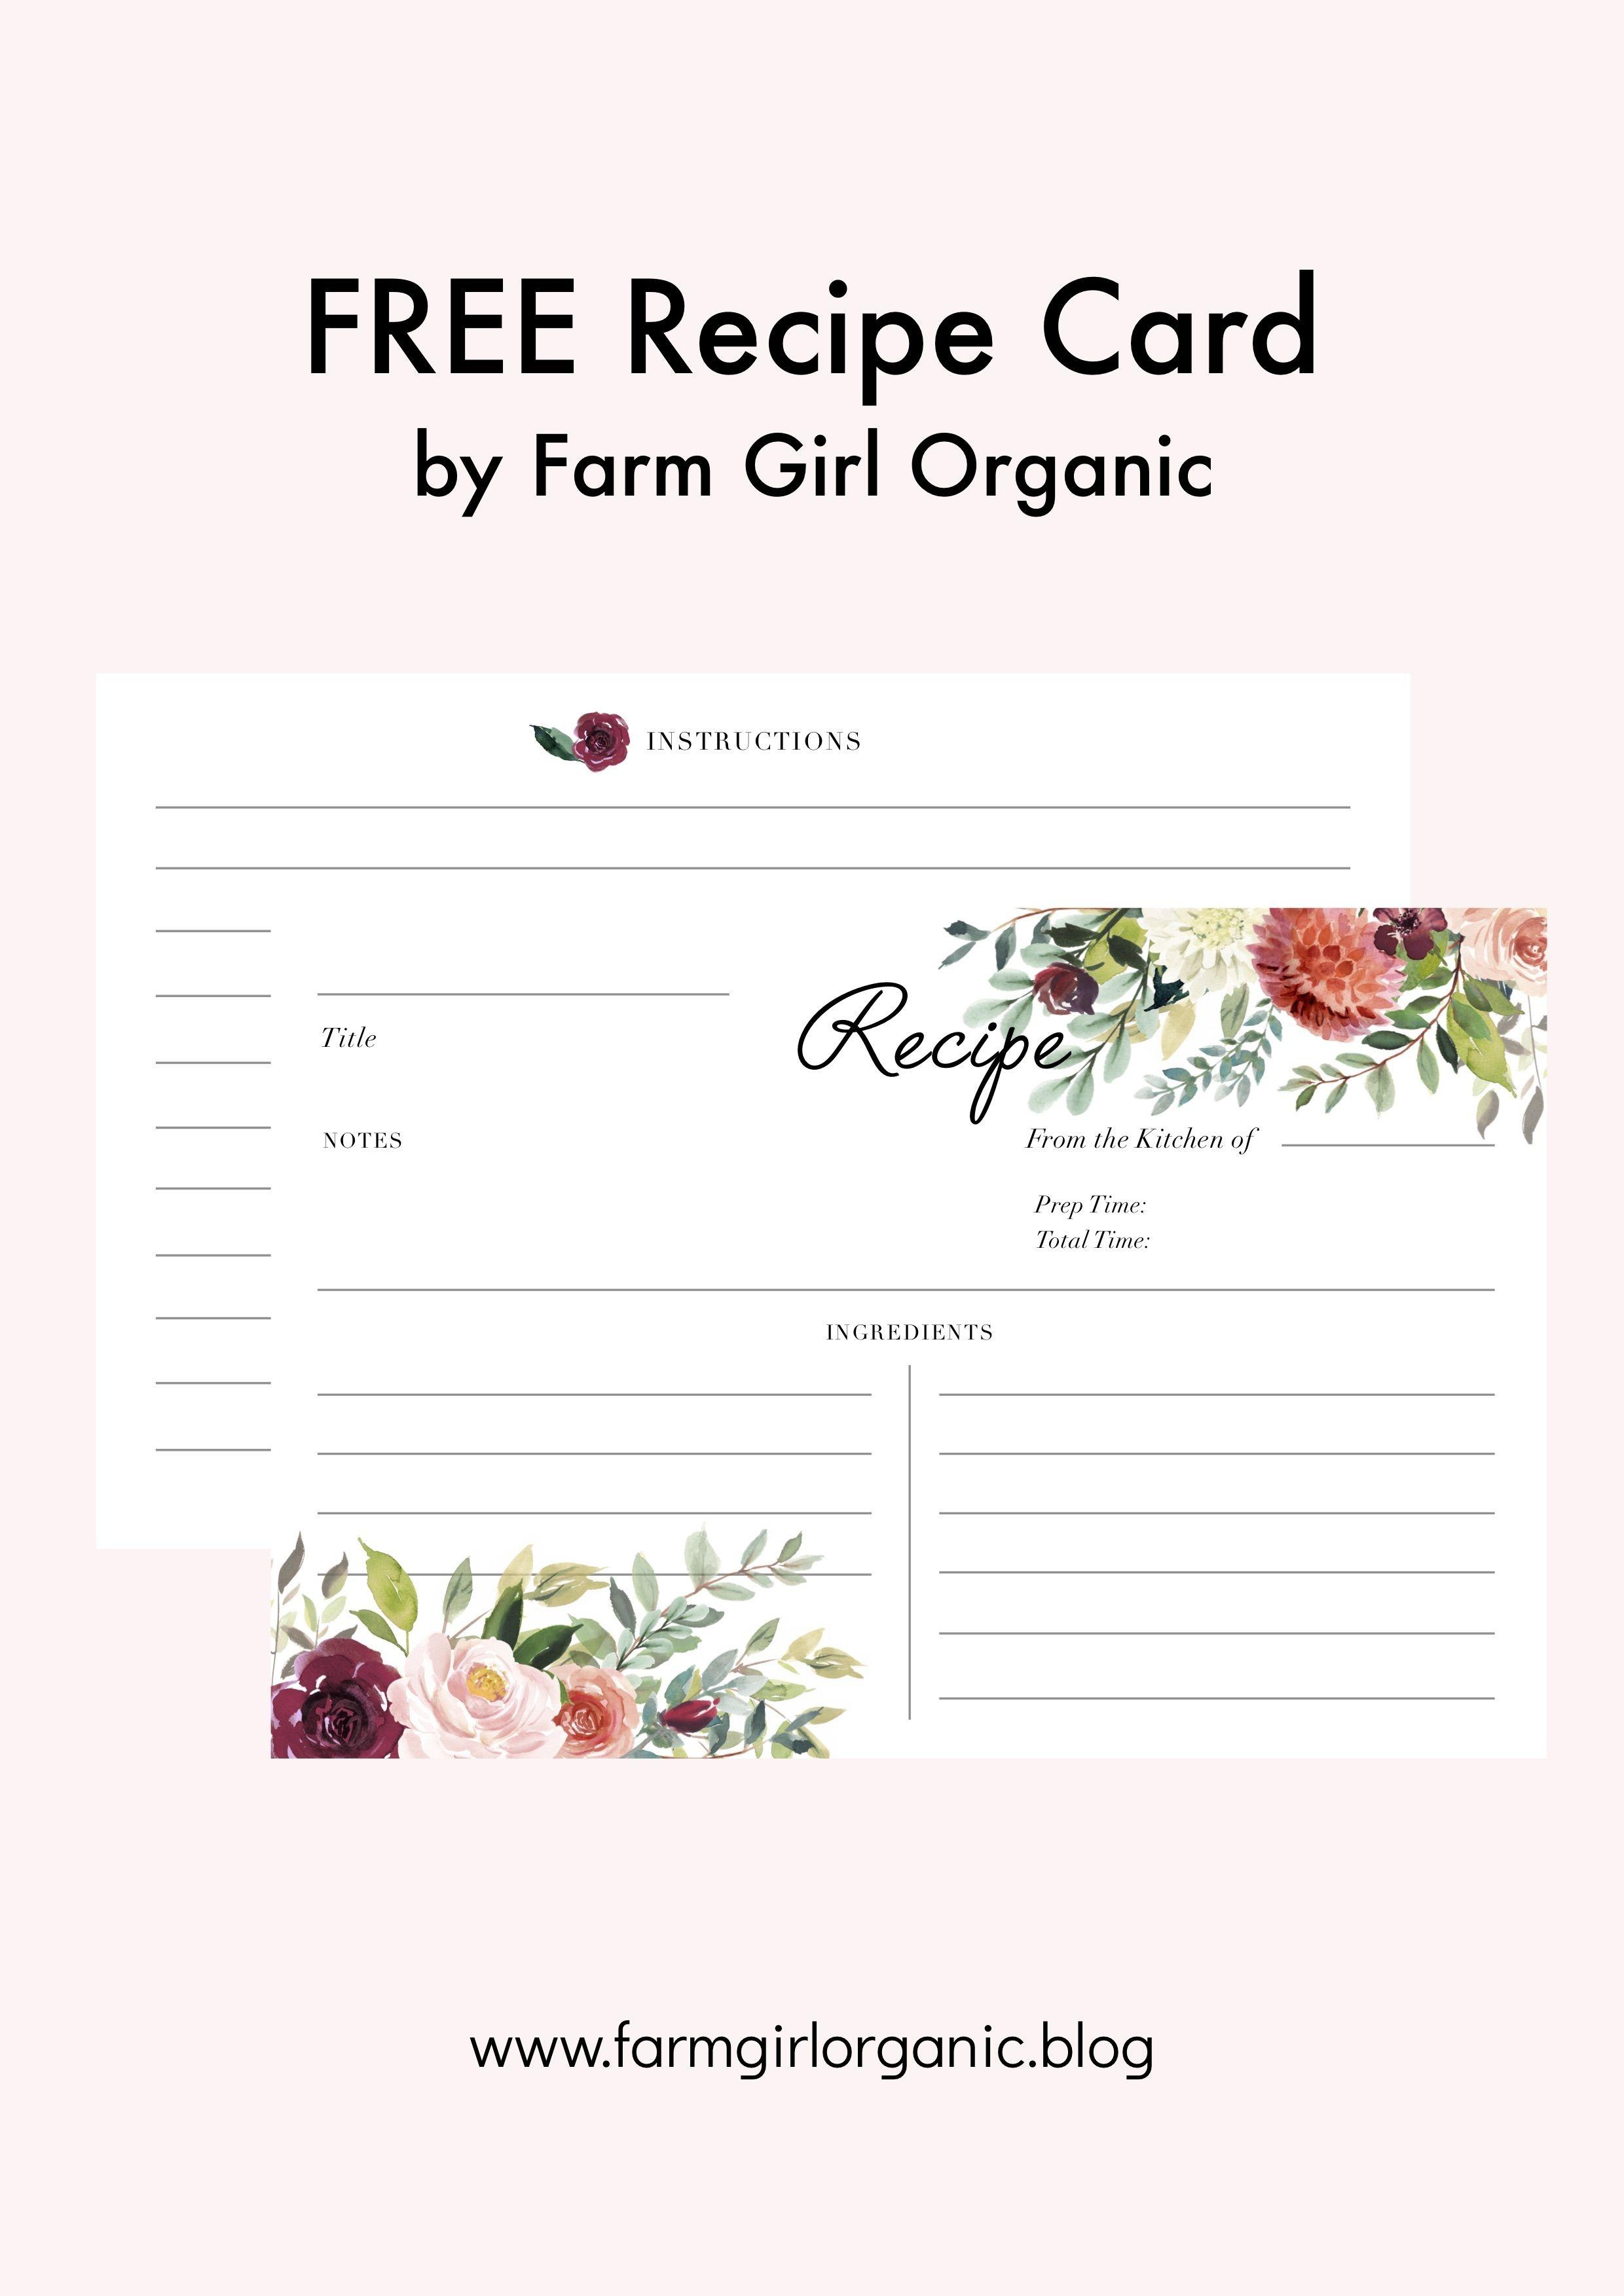 Free Printable Recipe Cardfarm Girl Organic ::::::::: Pdf File - Free Printable Cookbooks Pdf